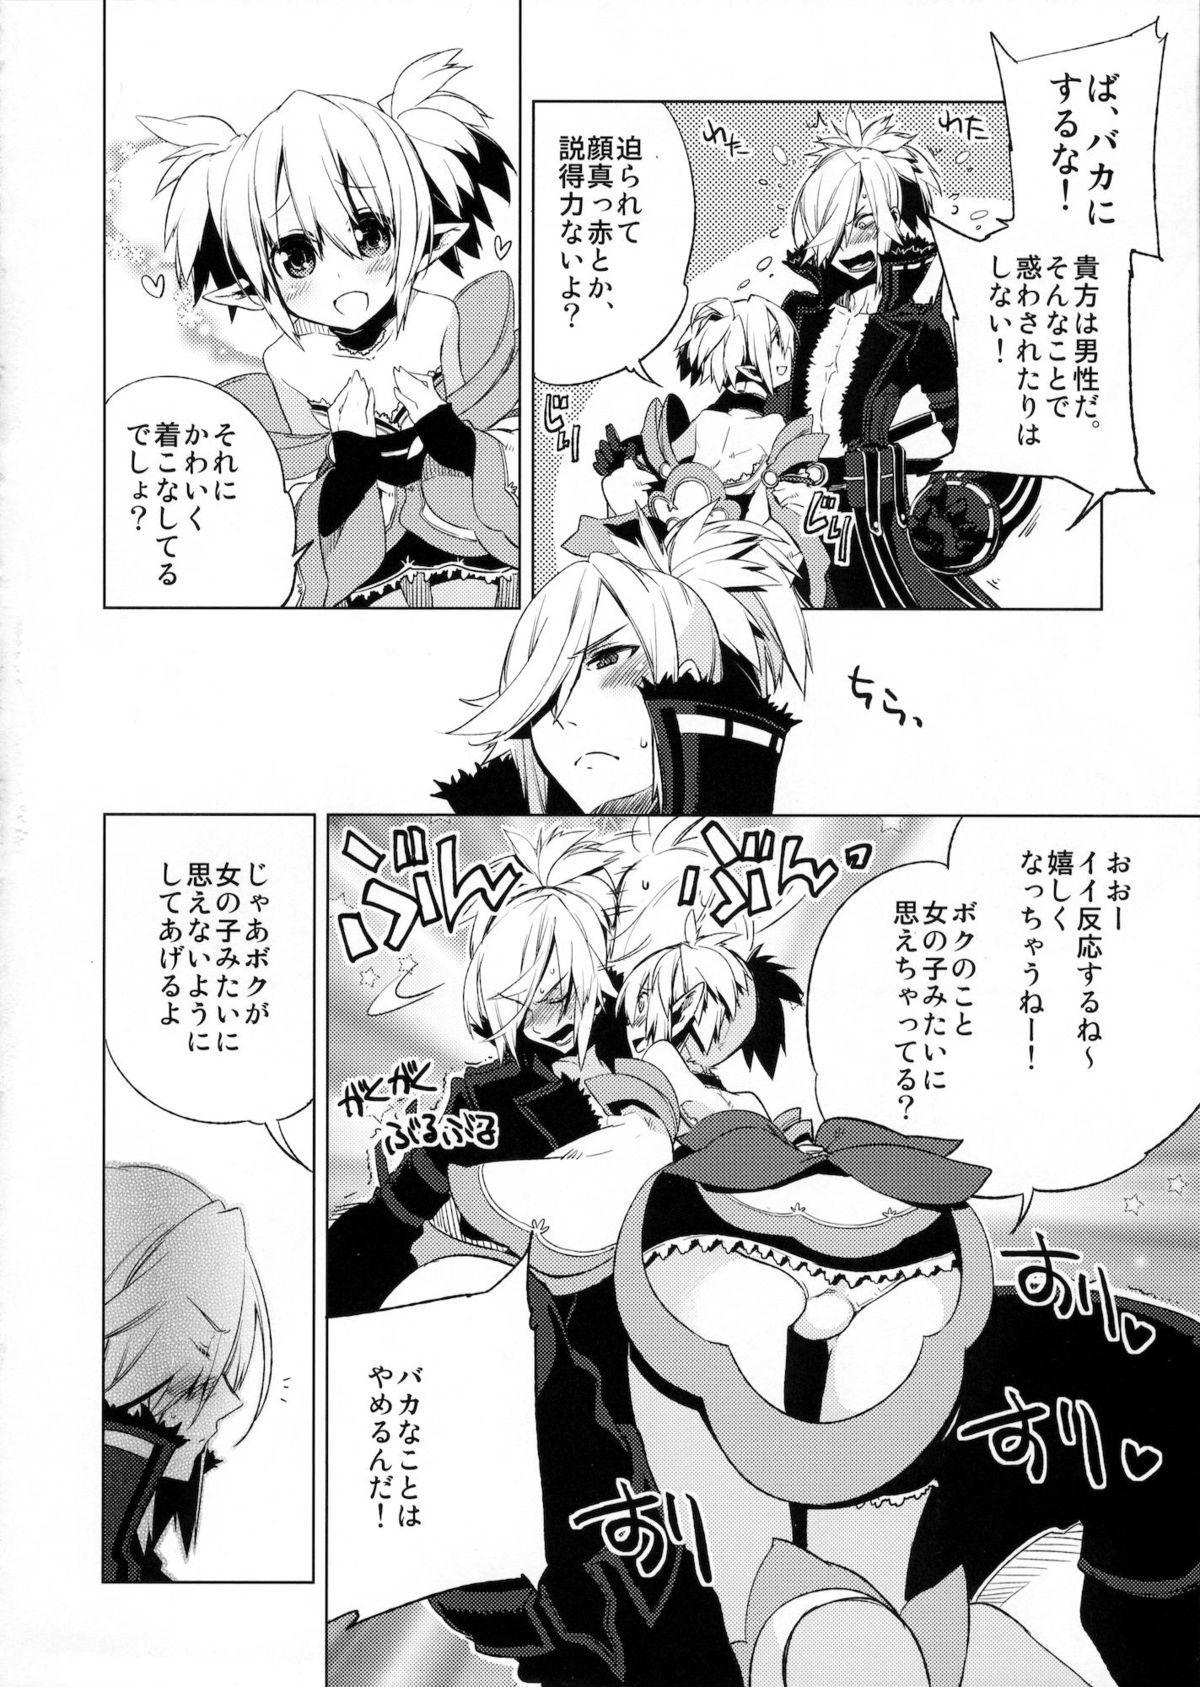 Korizu ni Josou Shounen Hon 6 Sizzle Infinity! 6